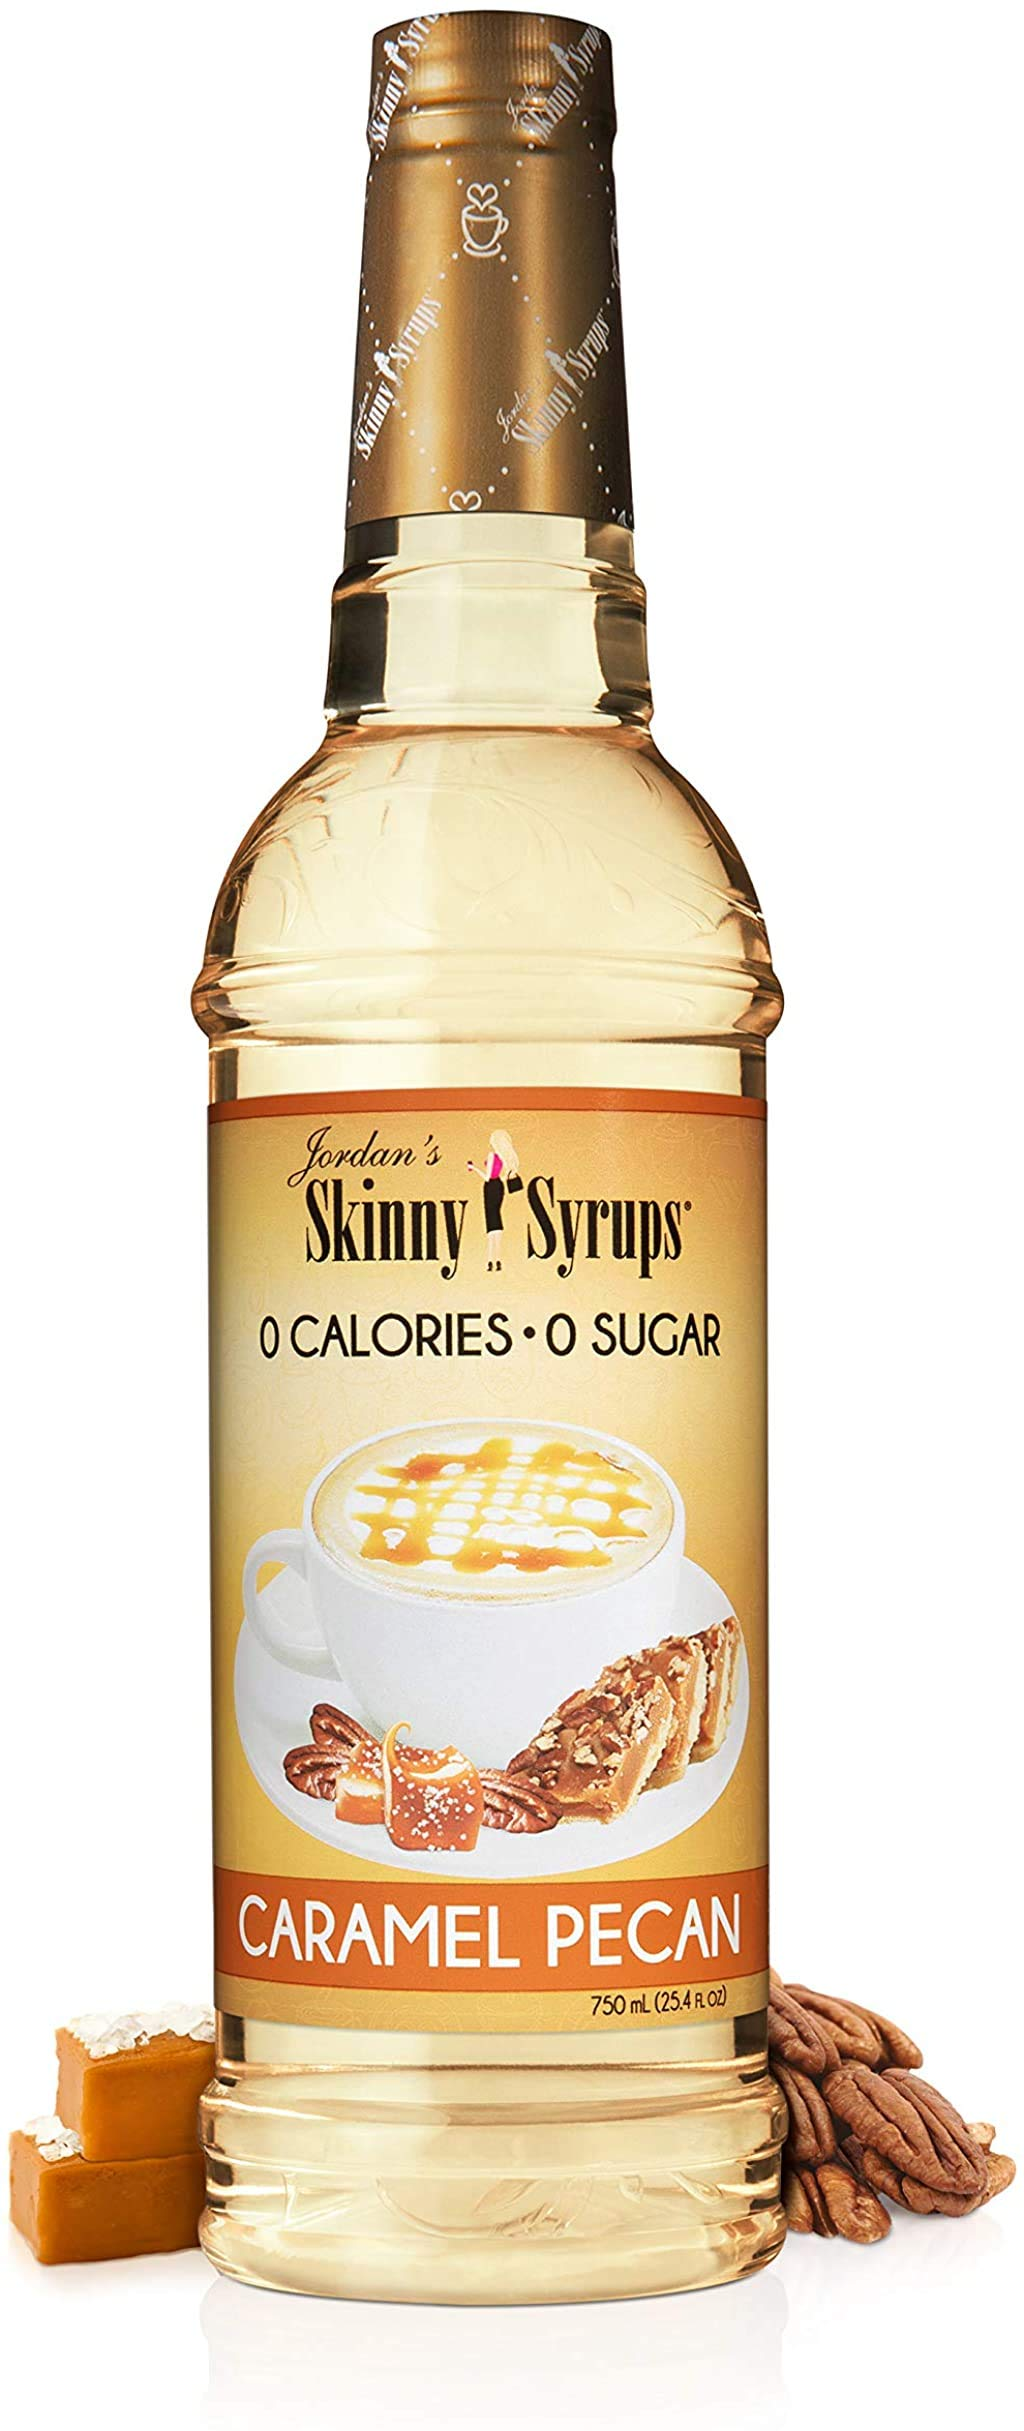 Jordan's Skinny Syrups Caramel Pecan, Sugar Free Coffee Flavoring Syrup, 25.4 Ounce Bottle